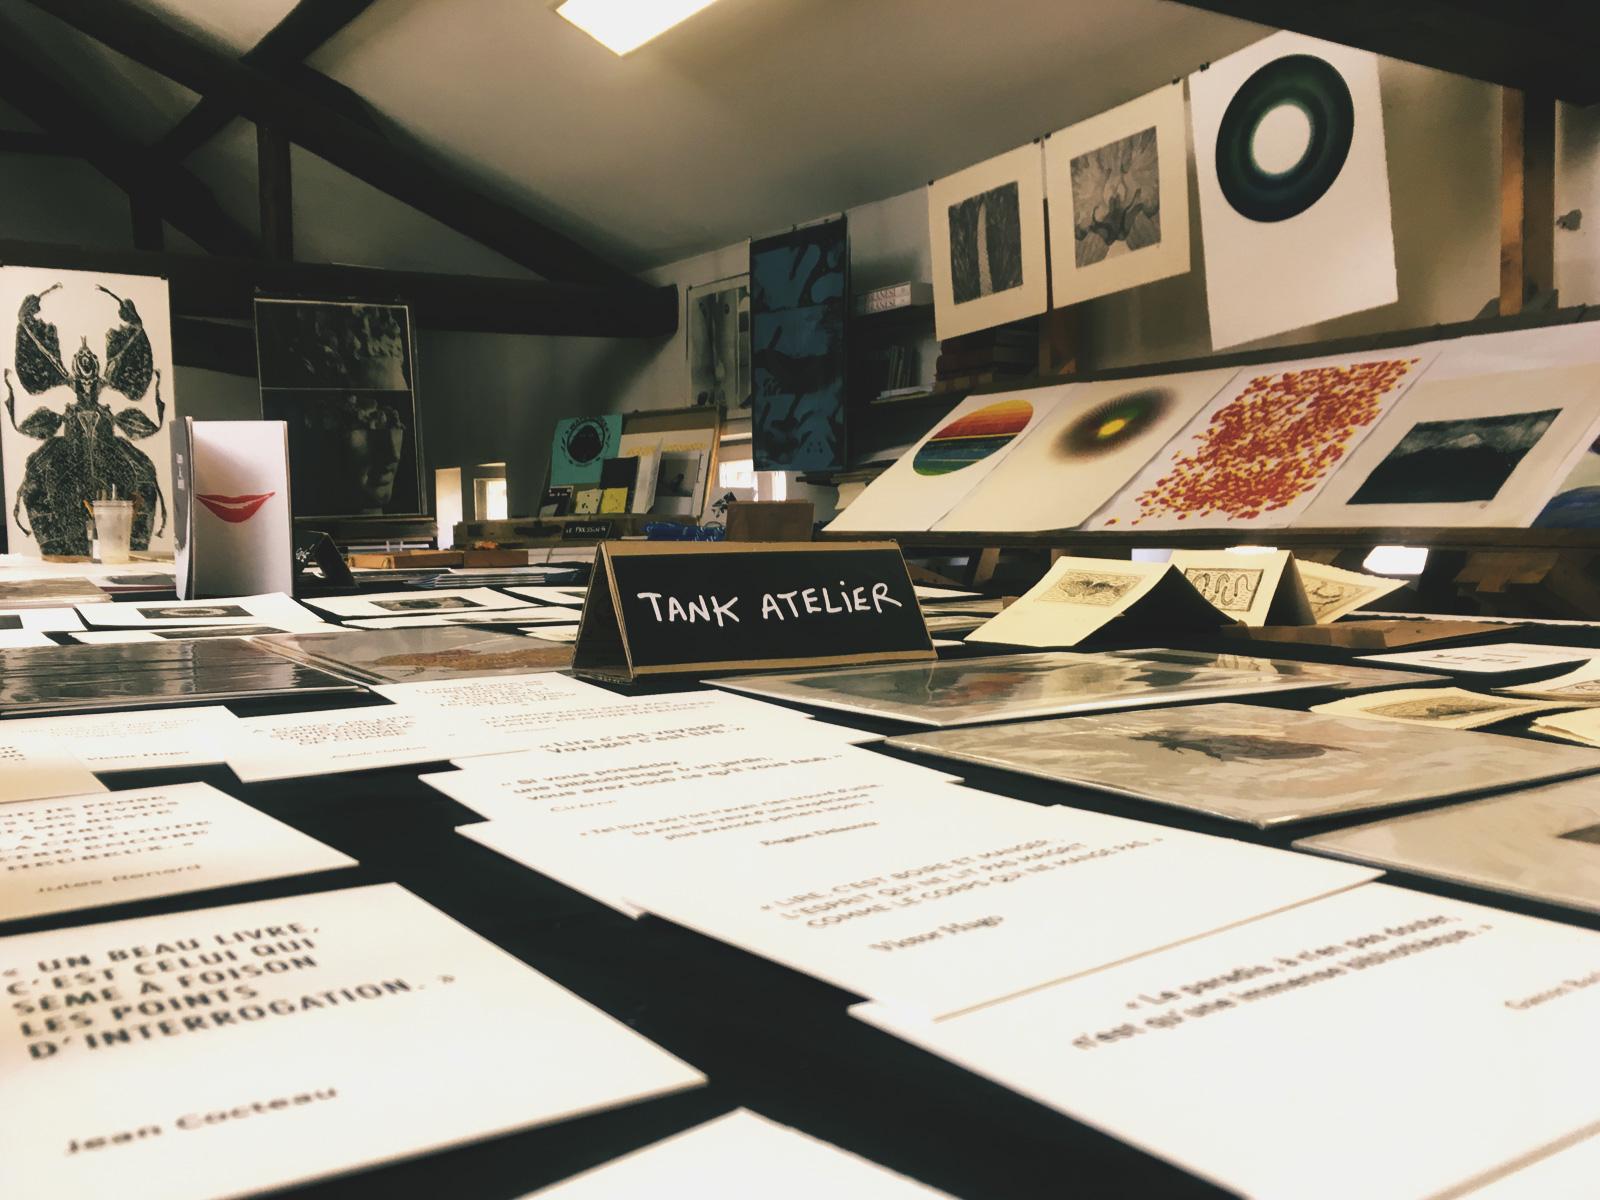 atelier tank impression estampes art nancy festival